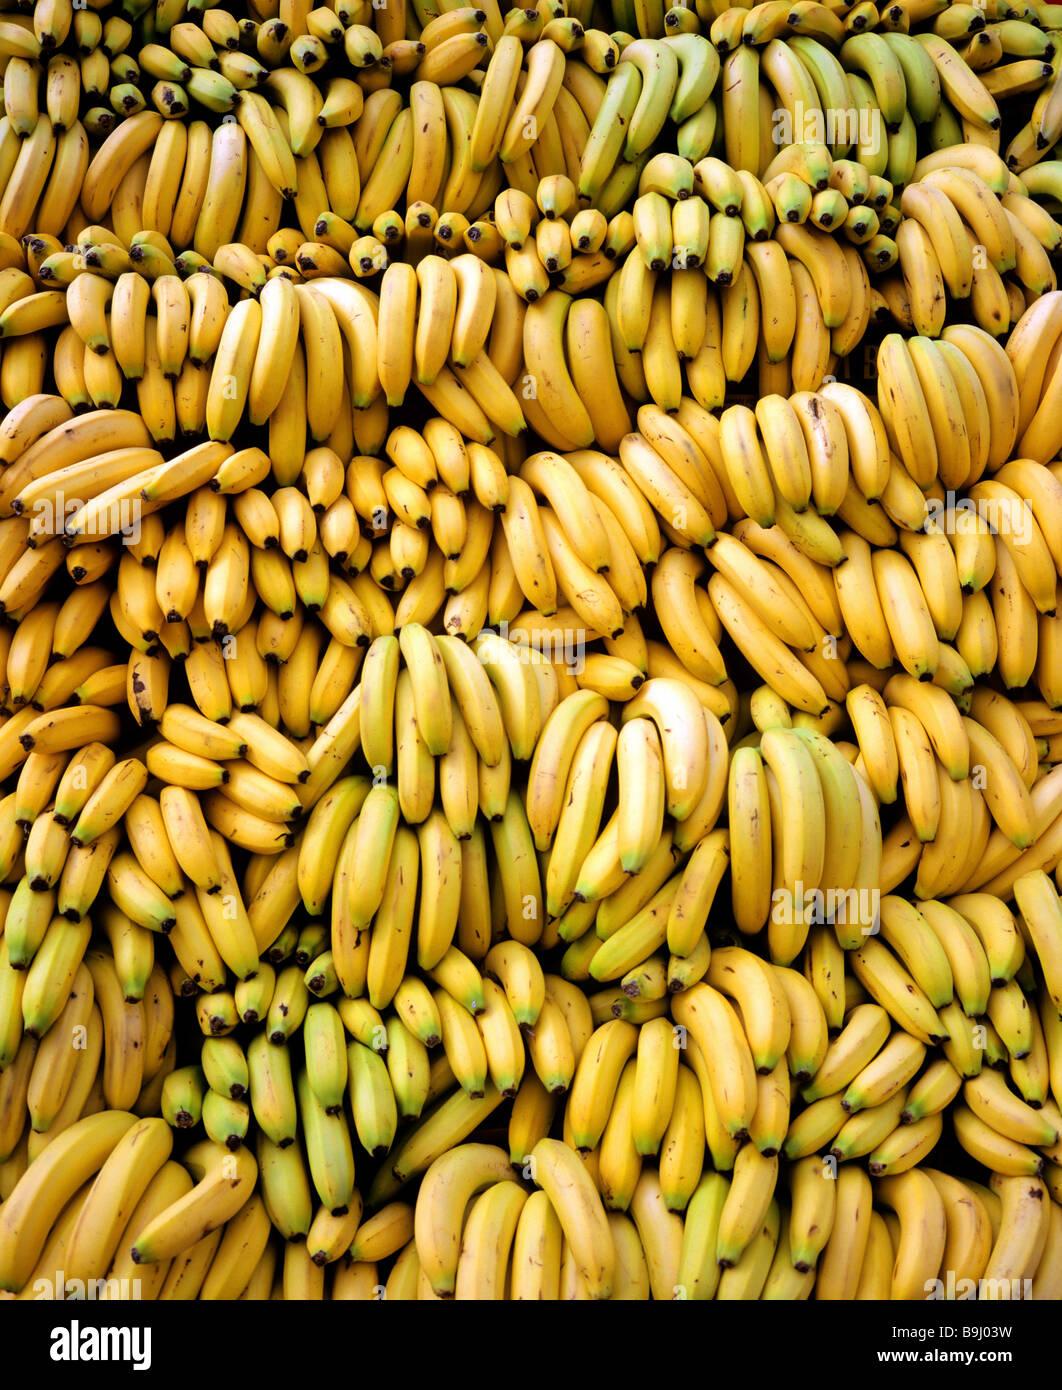 Banana (Musa × paradisiaca), pile of bananas - Stock Image